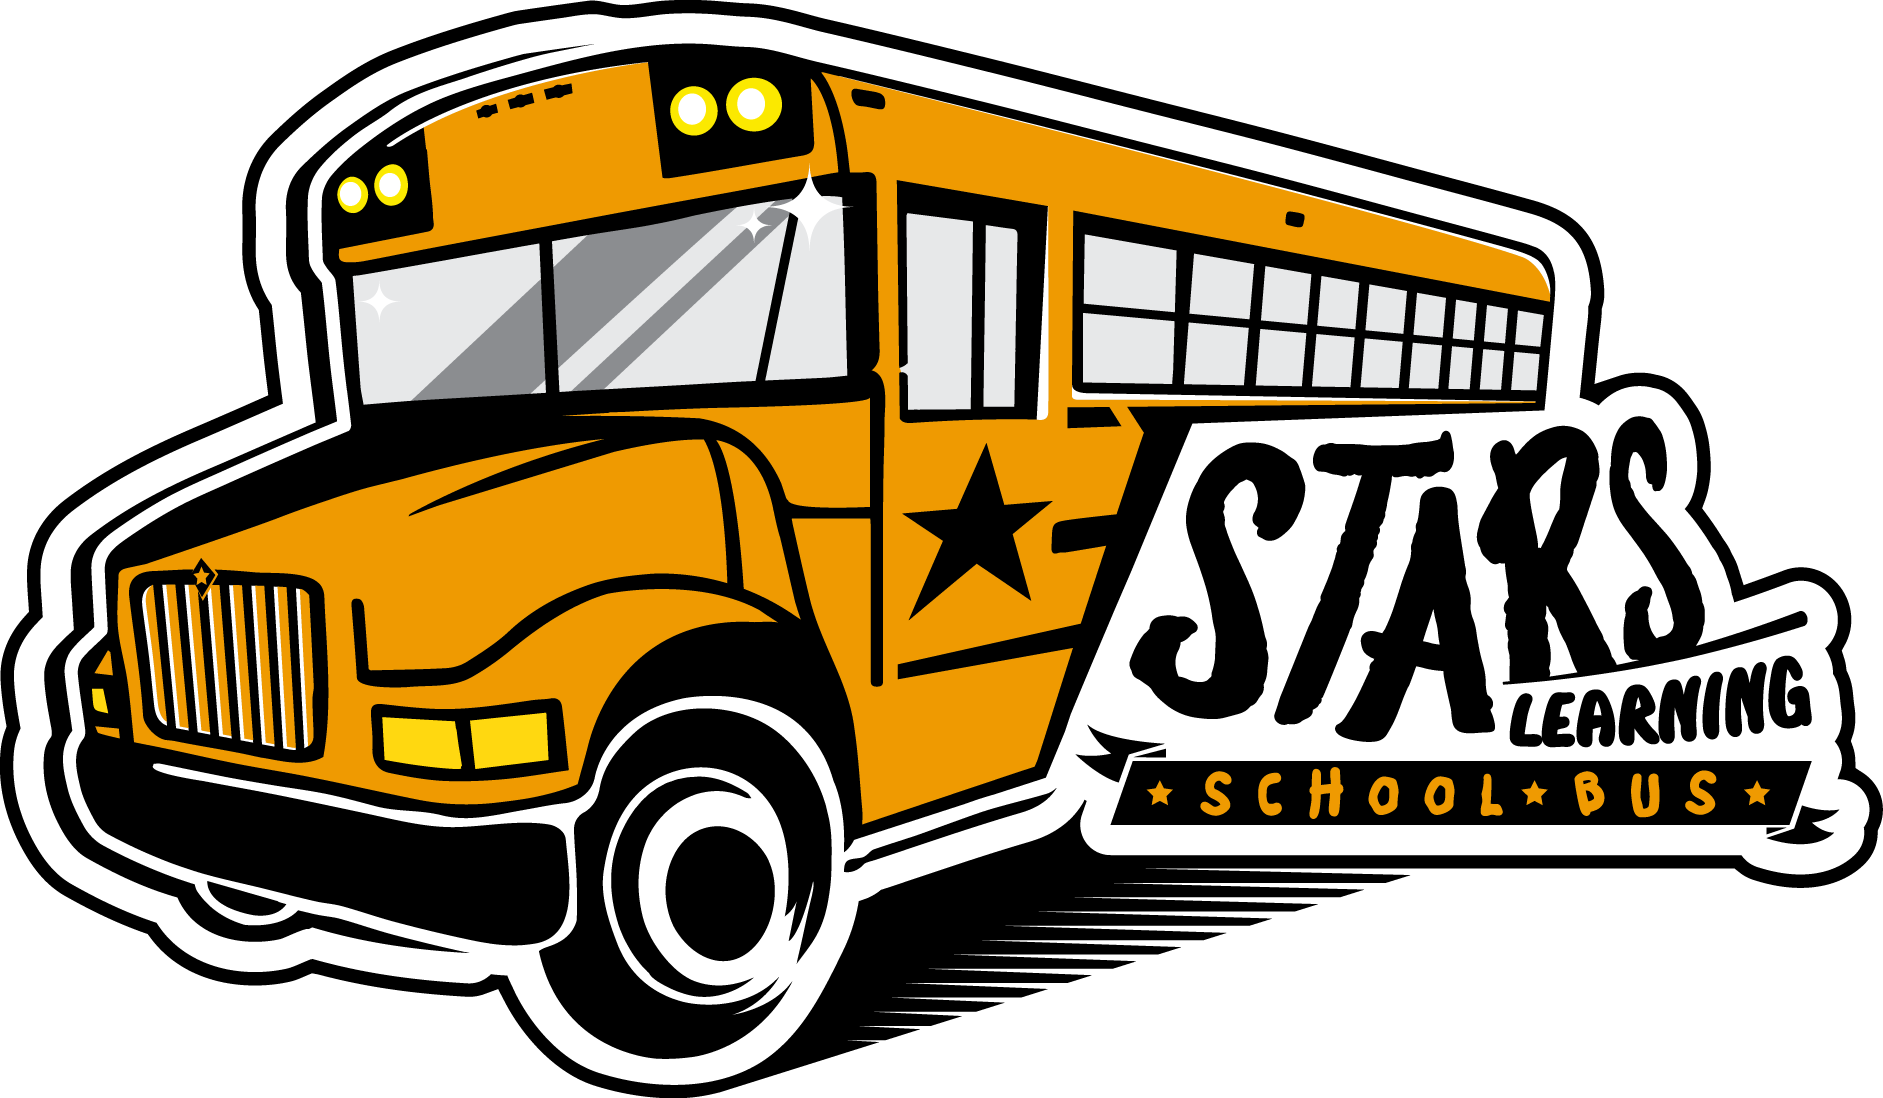 School Bus Cartoon clipart - Bus, Product, Font, transparent clip art